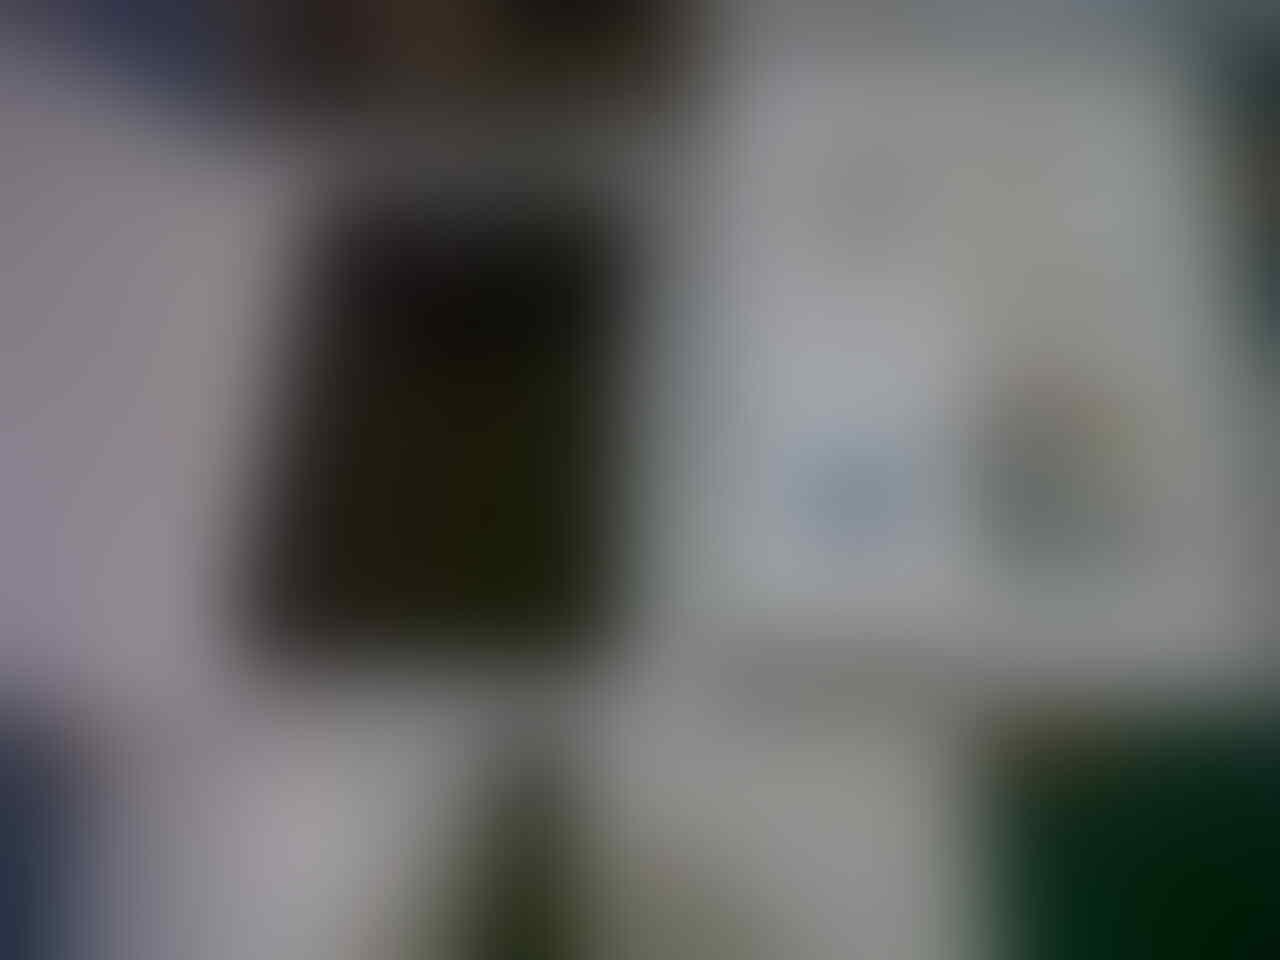 Ainol Novo 7 Flame dan Crystal Dual Core 1.5GHz 7 inch IPS Screen